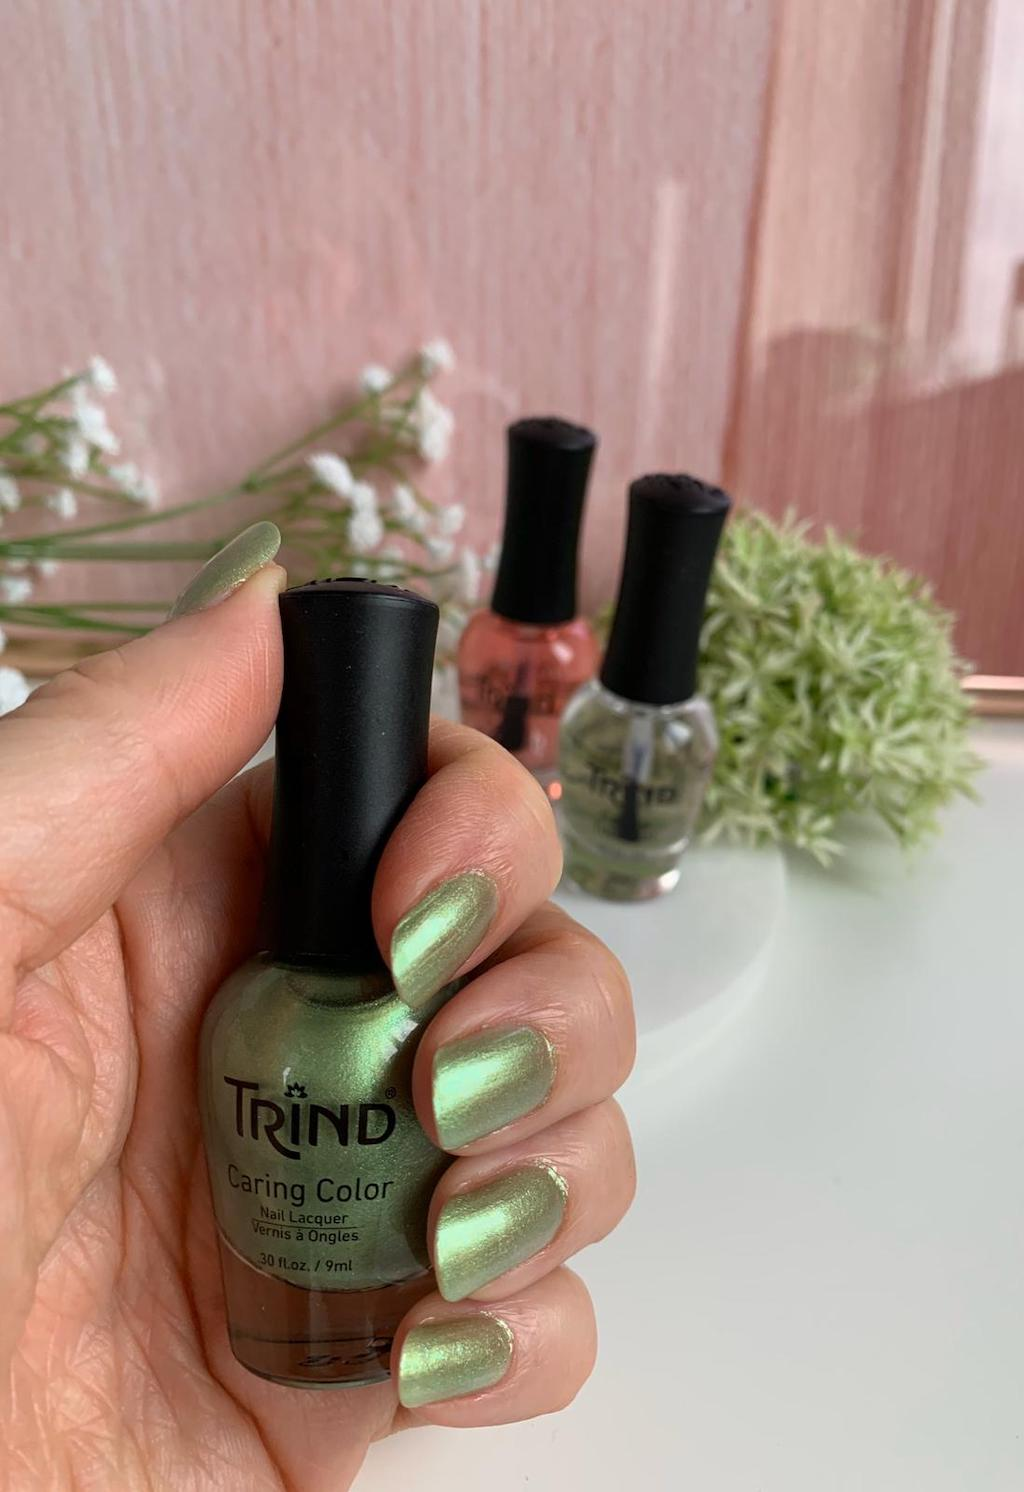 Trind nagellak Sparkling Moss review